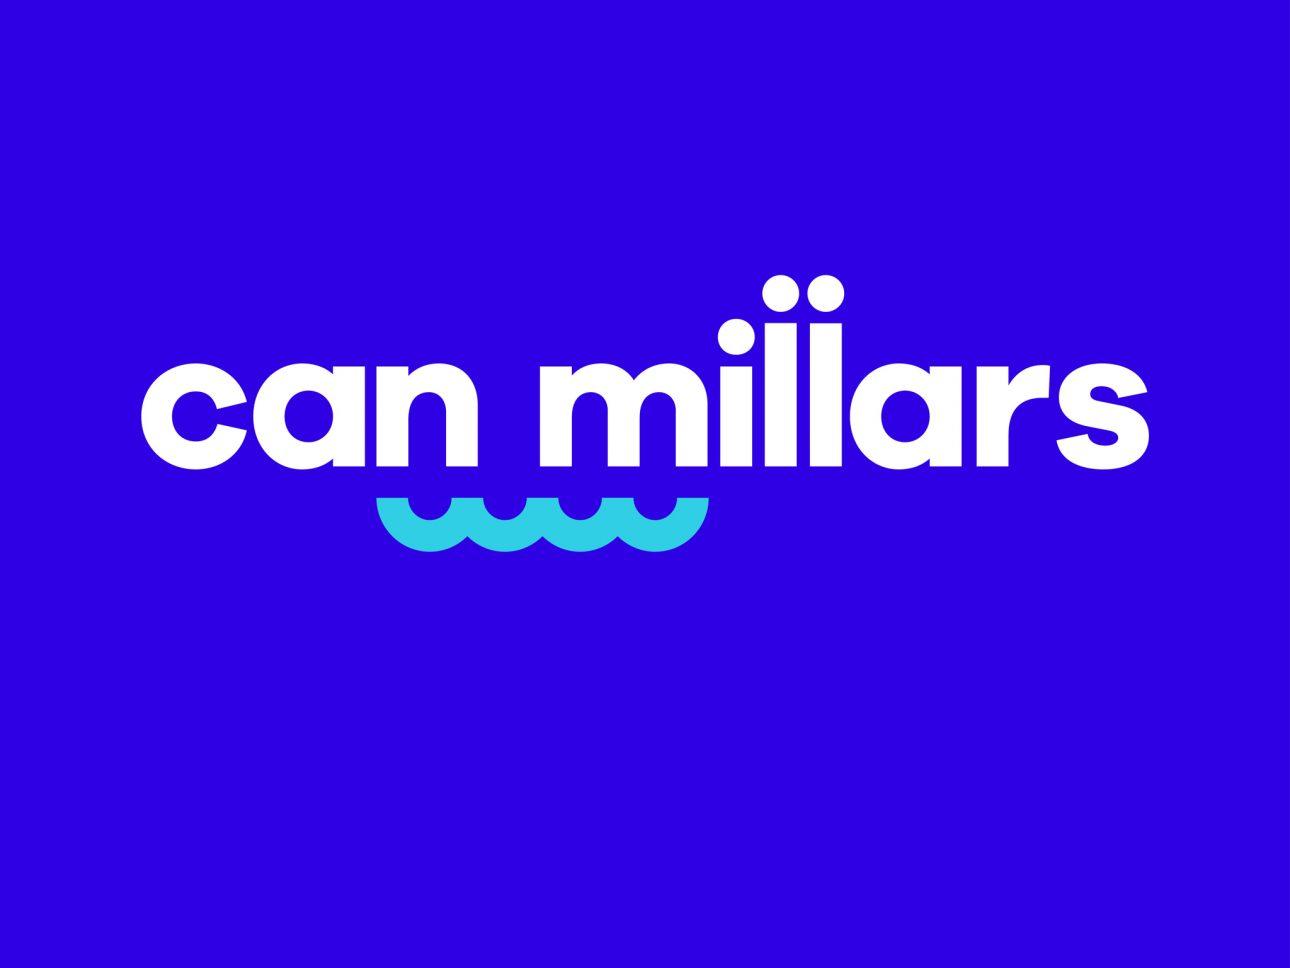 SD_CAN-MILLARS_05